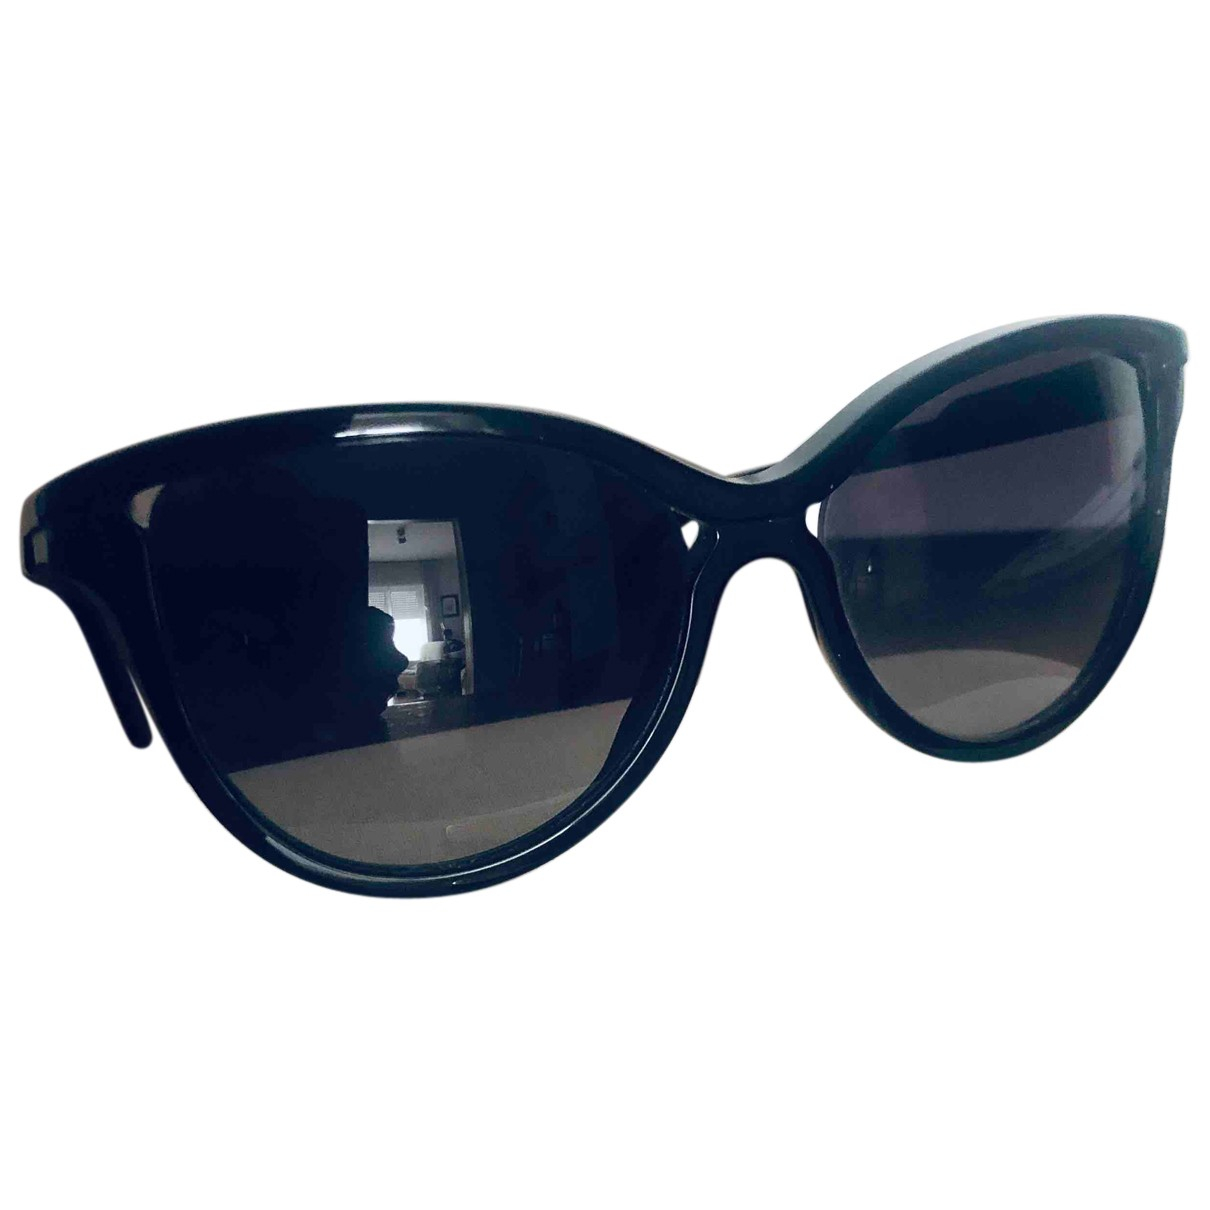 Stella Mccartney N Black Sunglasses for Women N